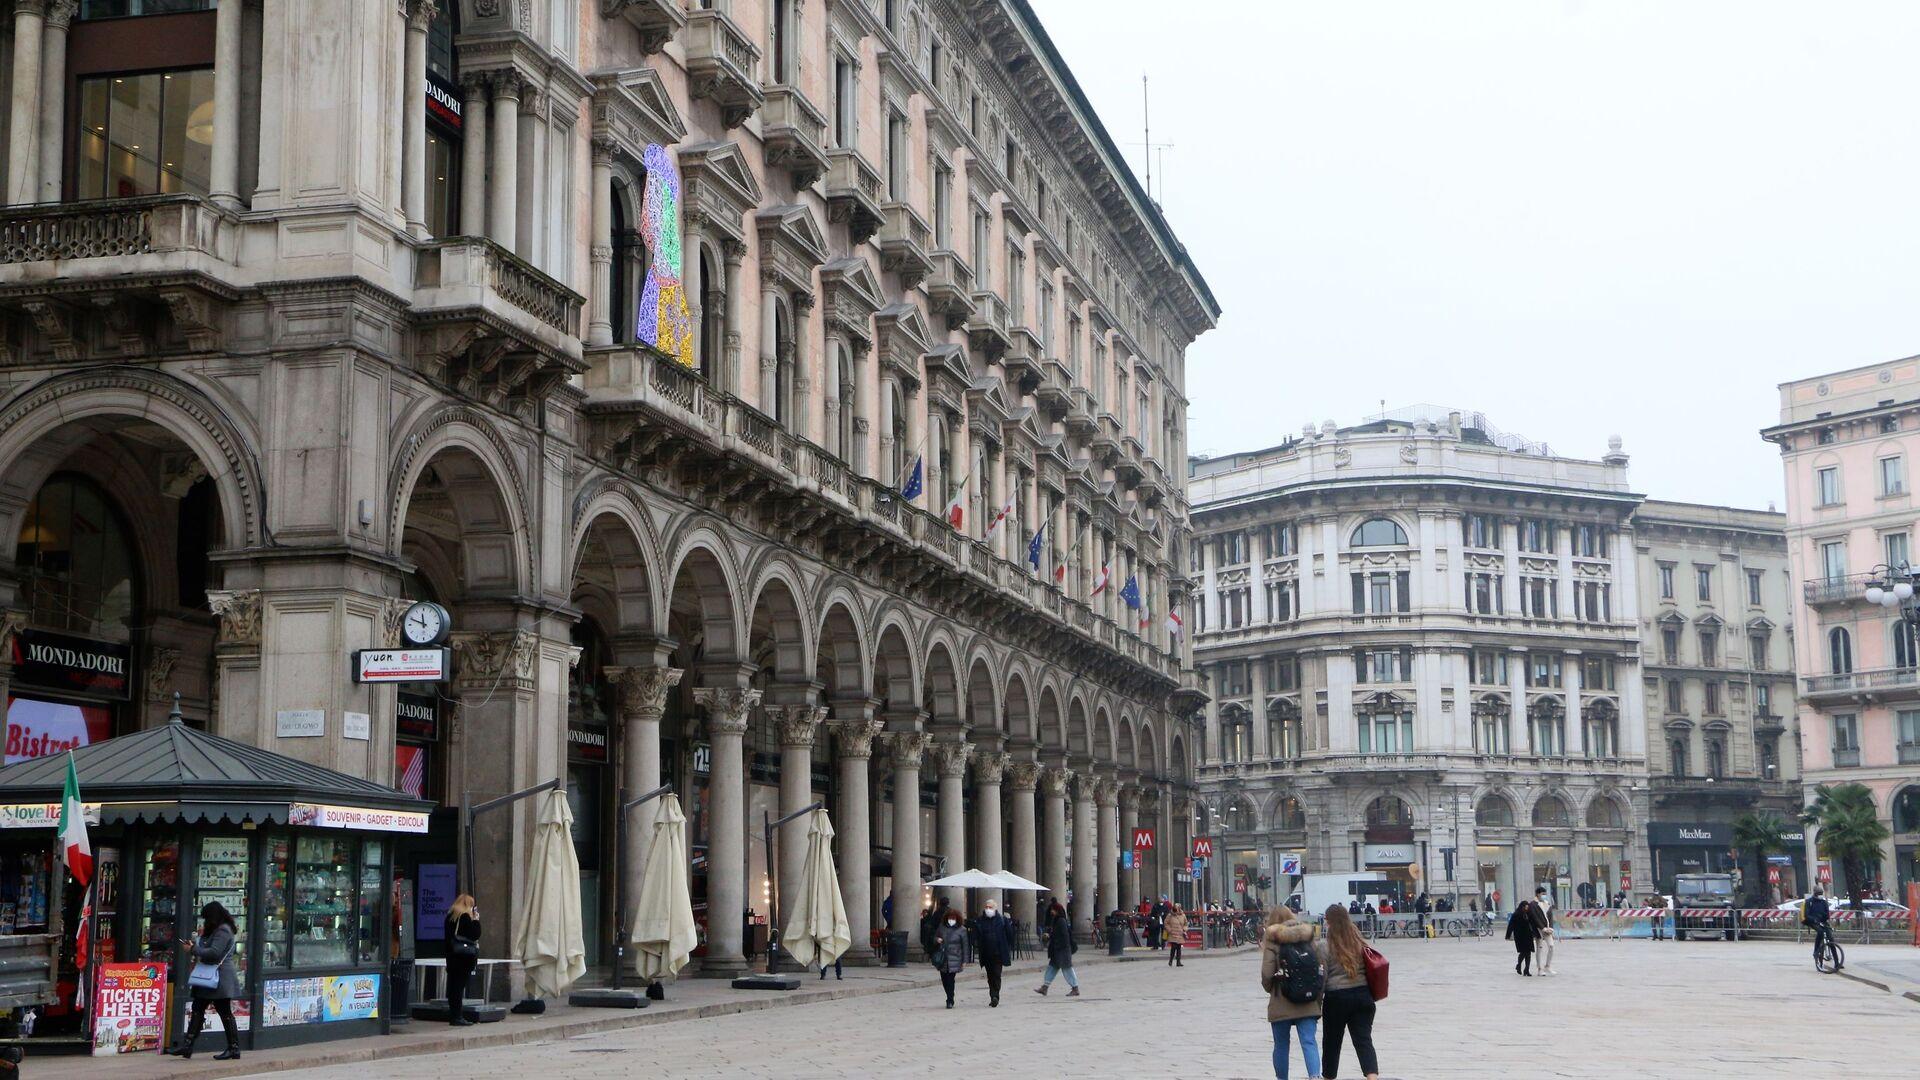 Una strada a Milano, Italia - Sputnik Italia, 1920, 03.04.2021